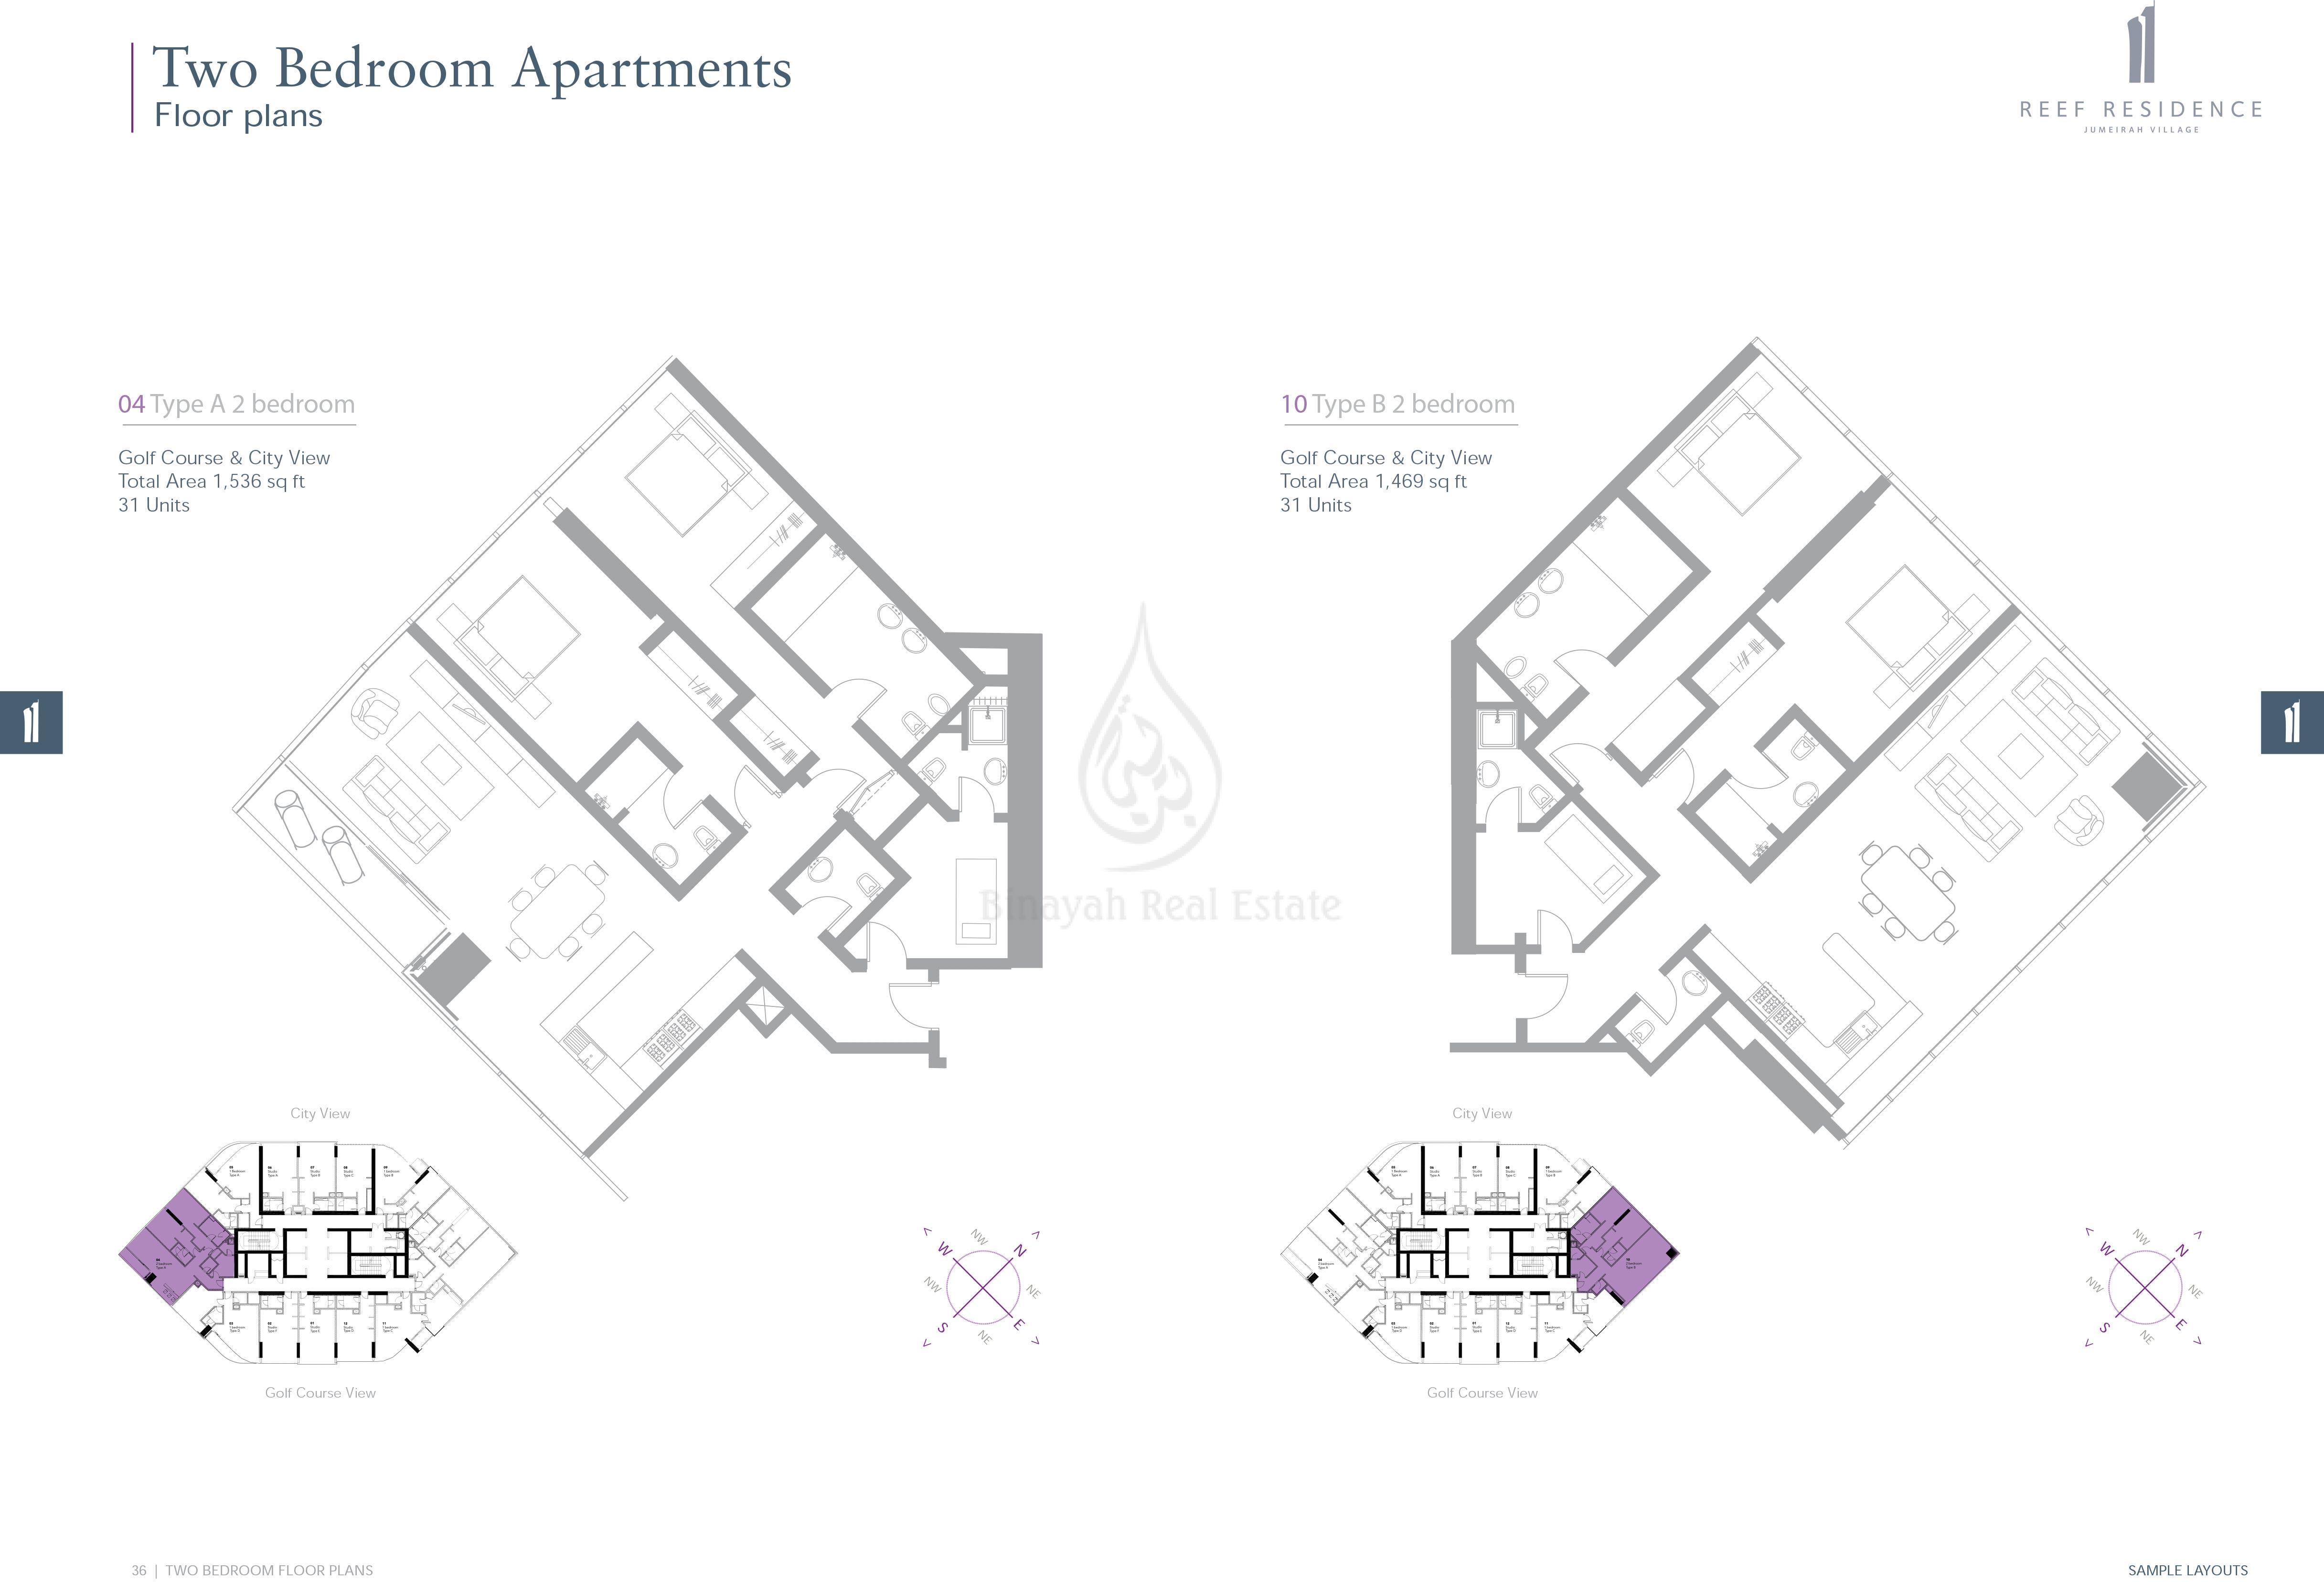 Jumeirah village circle apartments and villas for 2 bedroom floor plans pdf